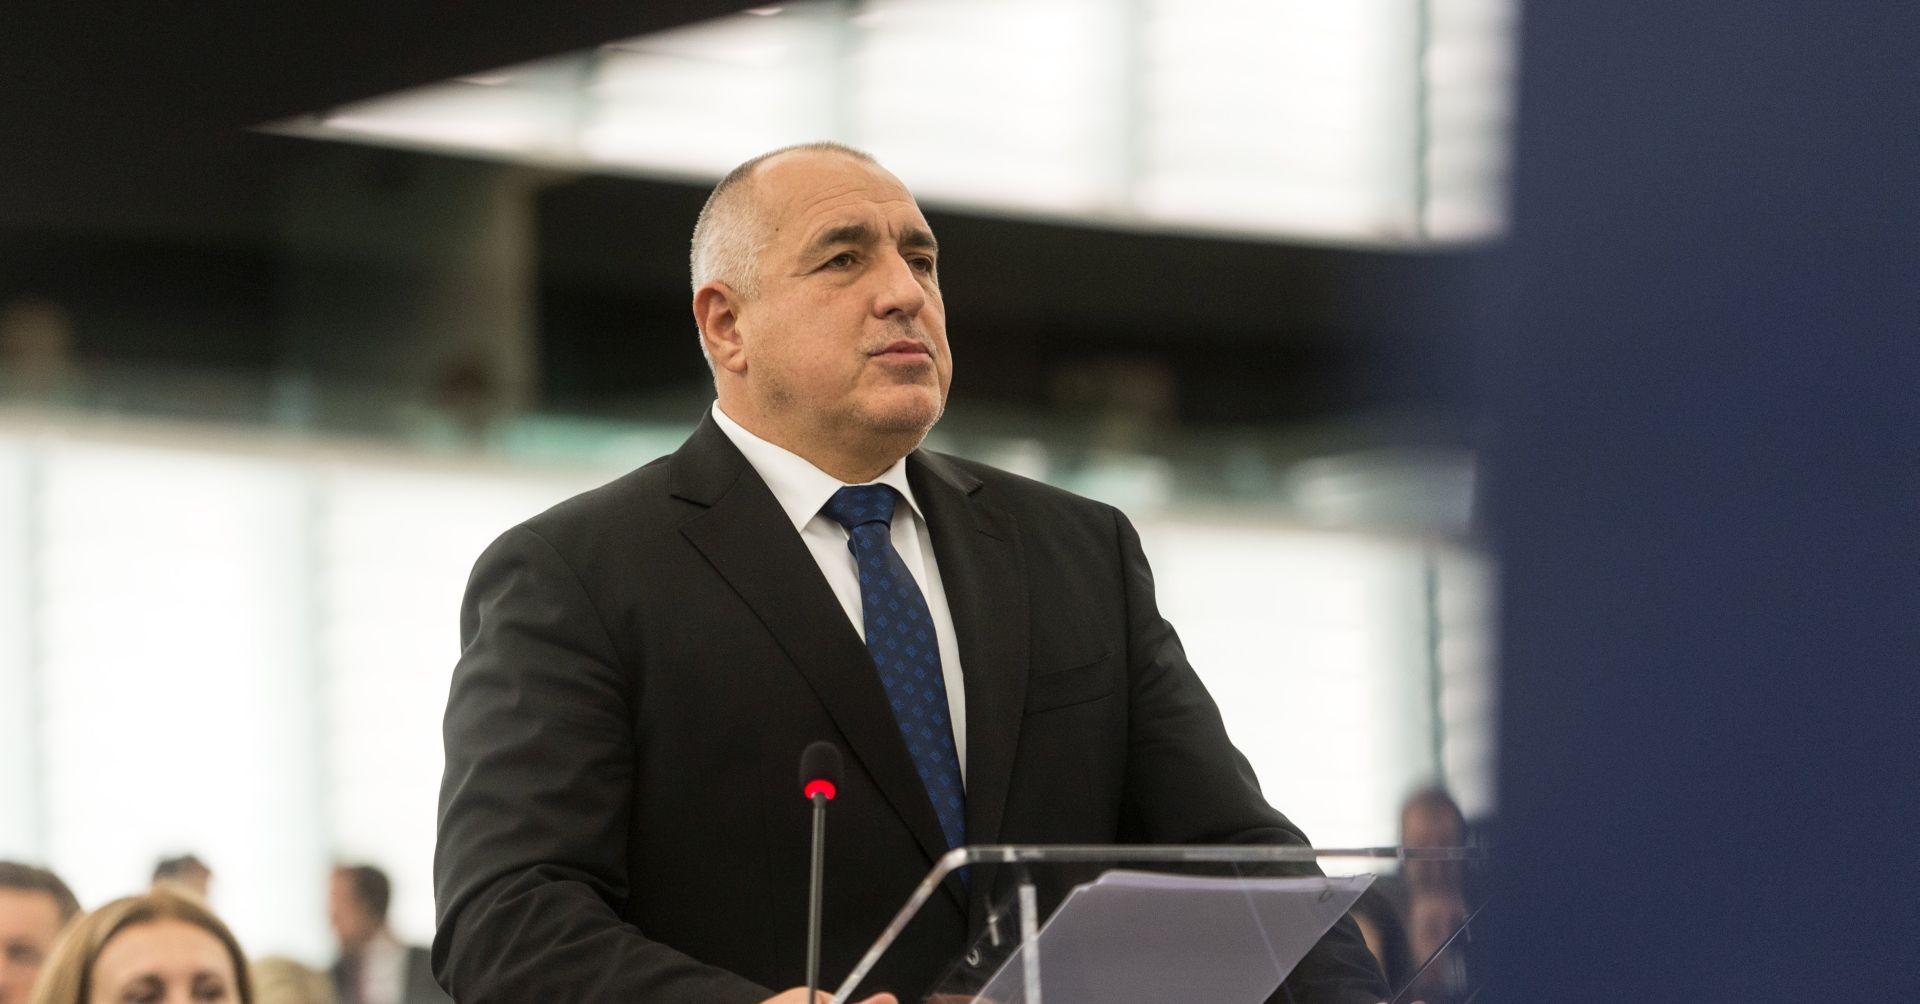 Bugarska povukla Istanbulsku konvenciju iz parlamenta